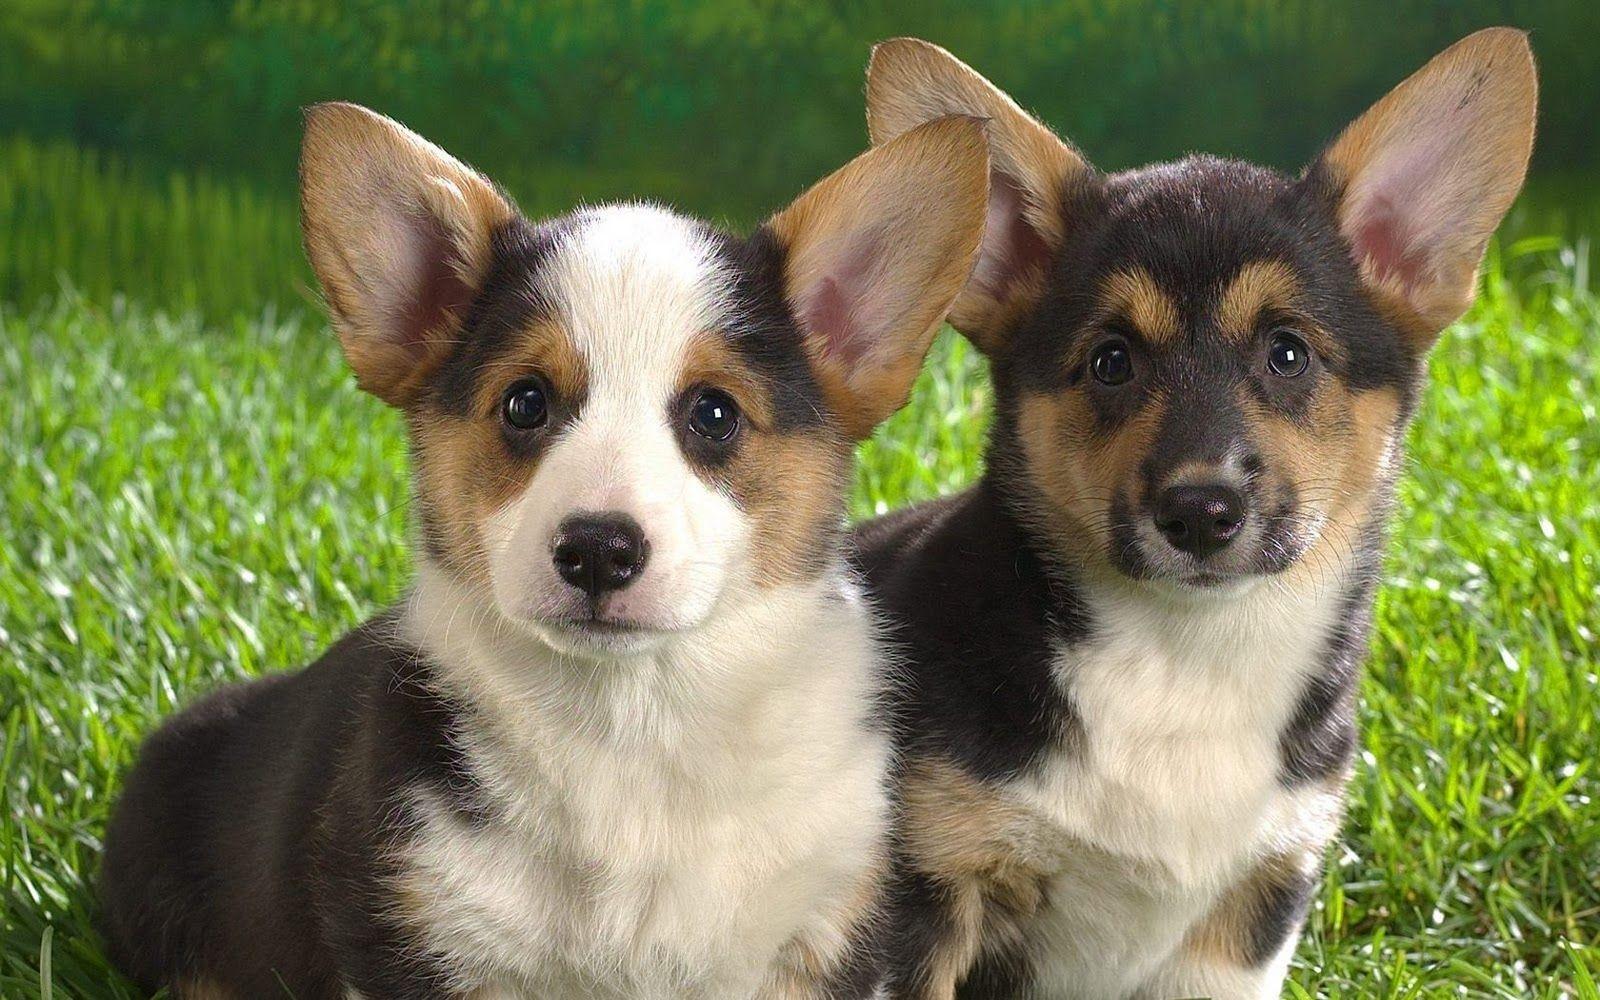 Cardigan Welsh Corgi Corgi Puppies For Sale Welsh Corgi Puppies Corgi Dog